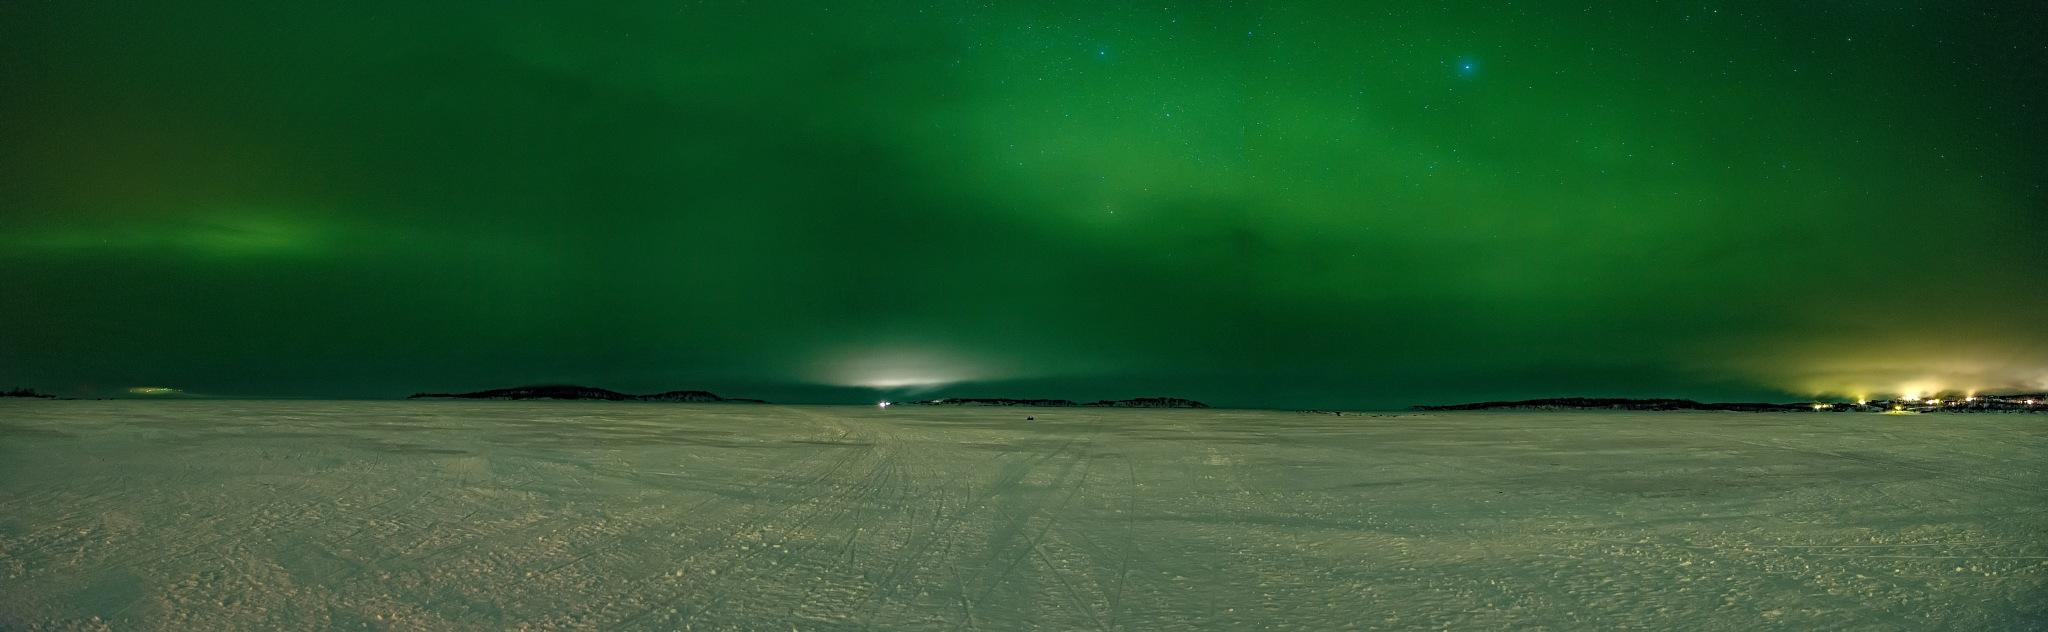 Northen Lights Pano by bob55